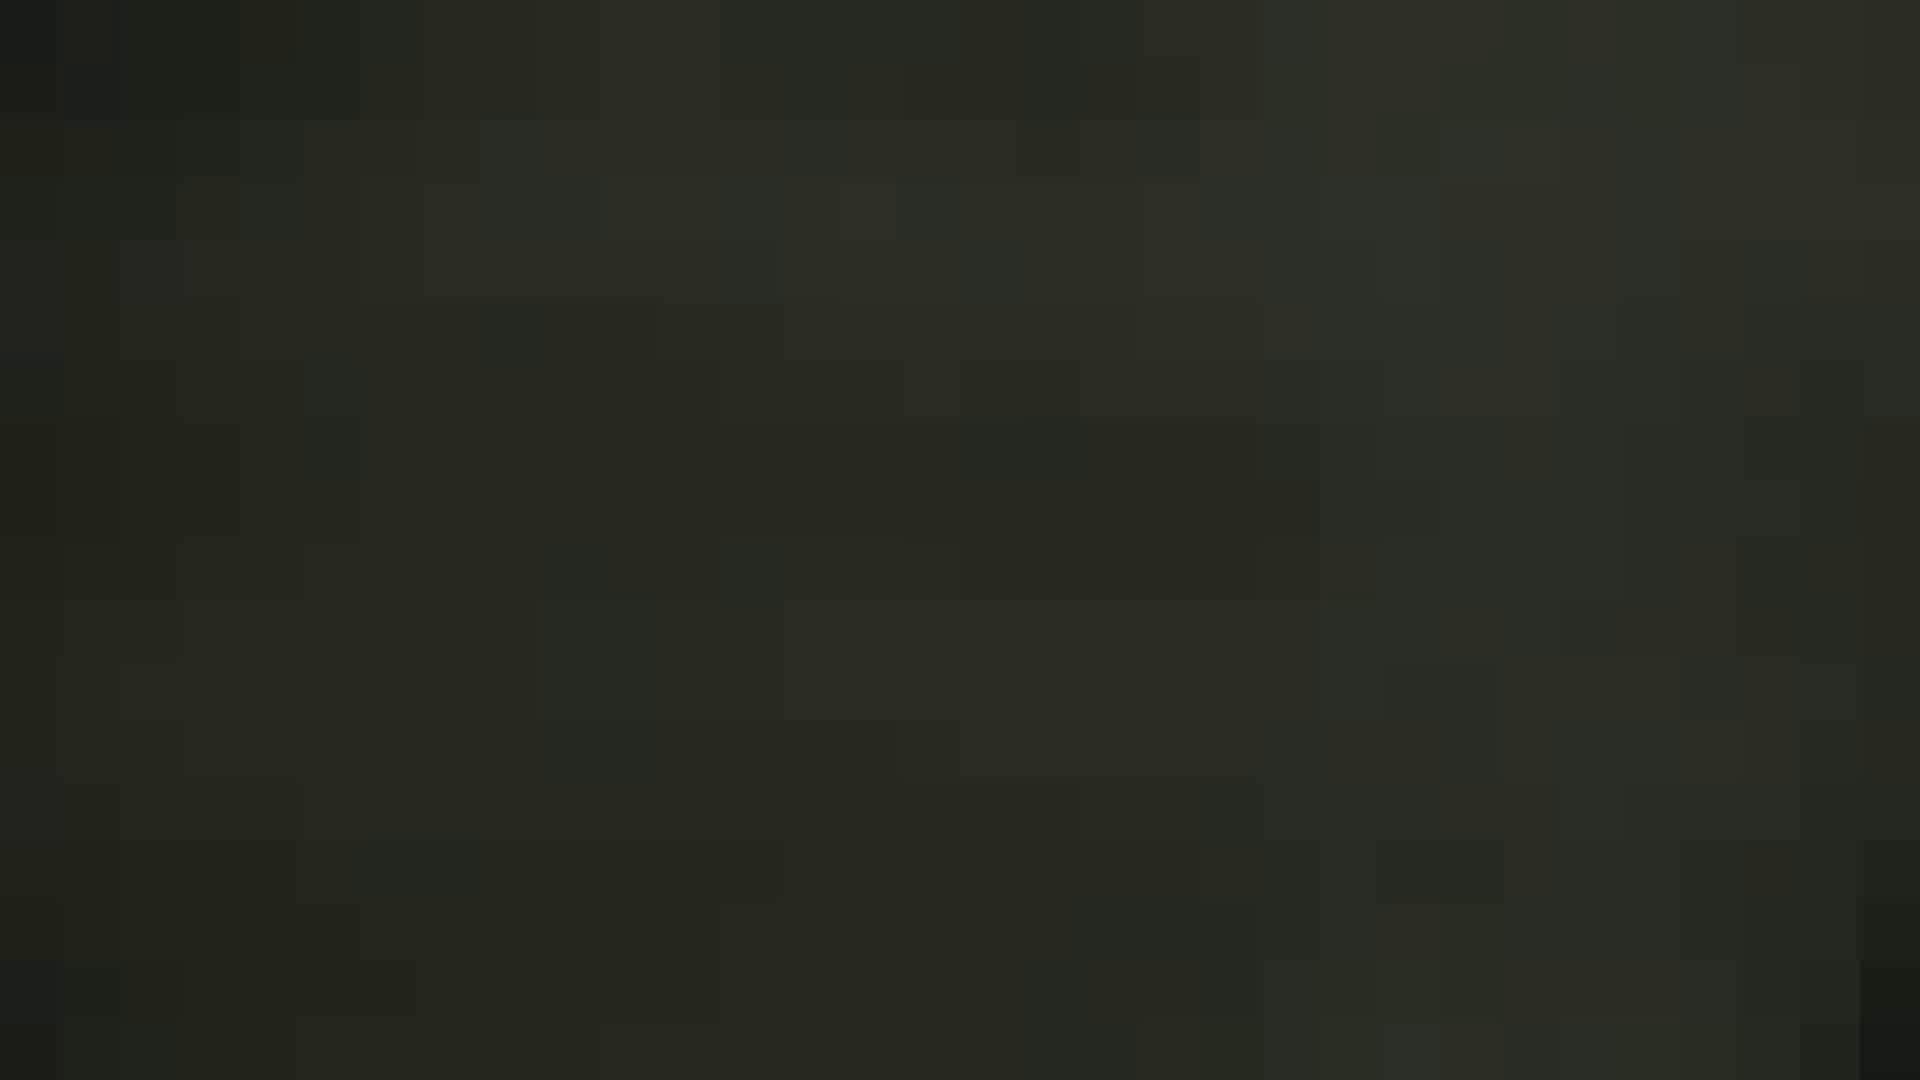 vol.25三十時間潜り、一つしか出会えない完璧桃尻編 byお銀 洗面所  61連発 9